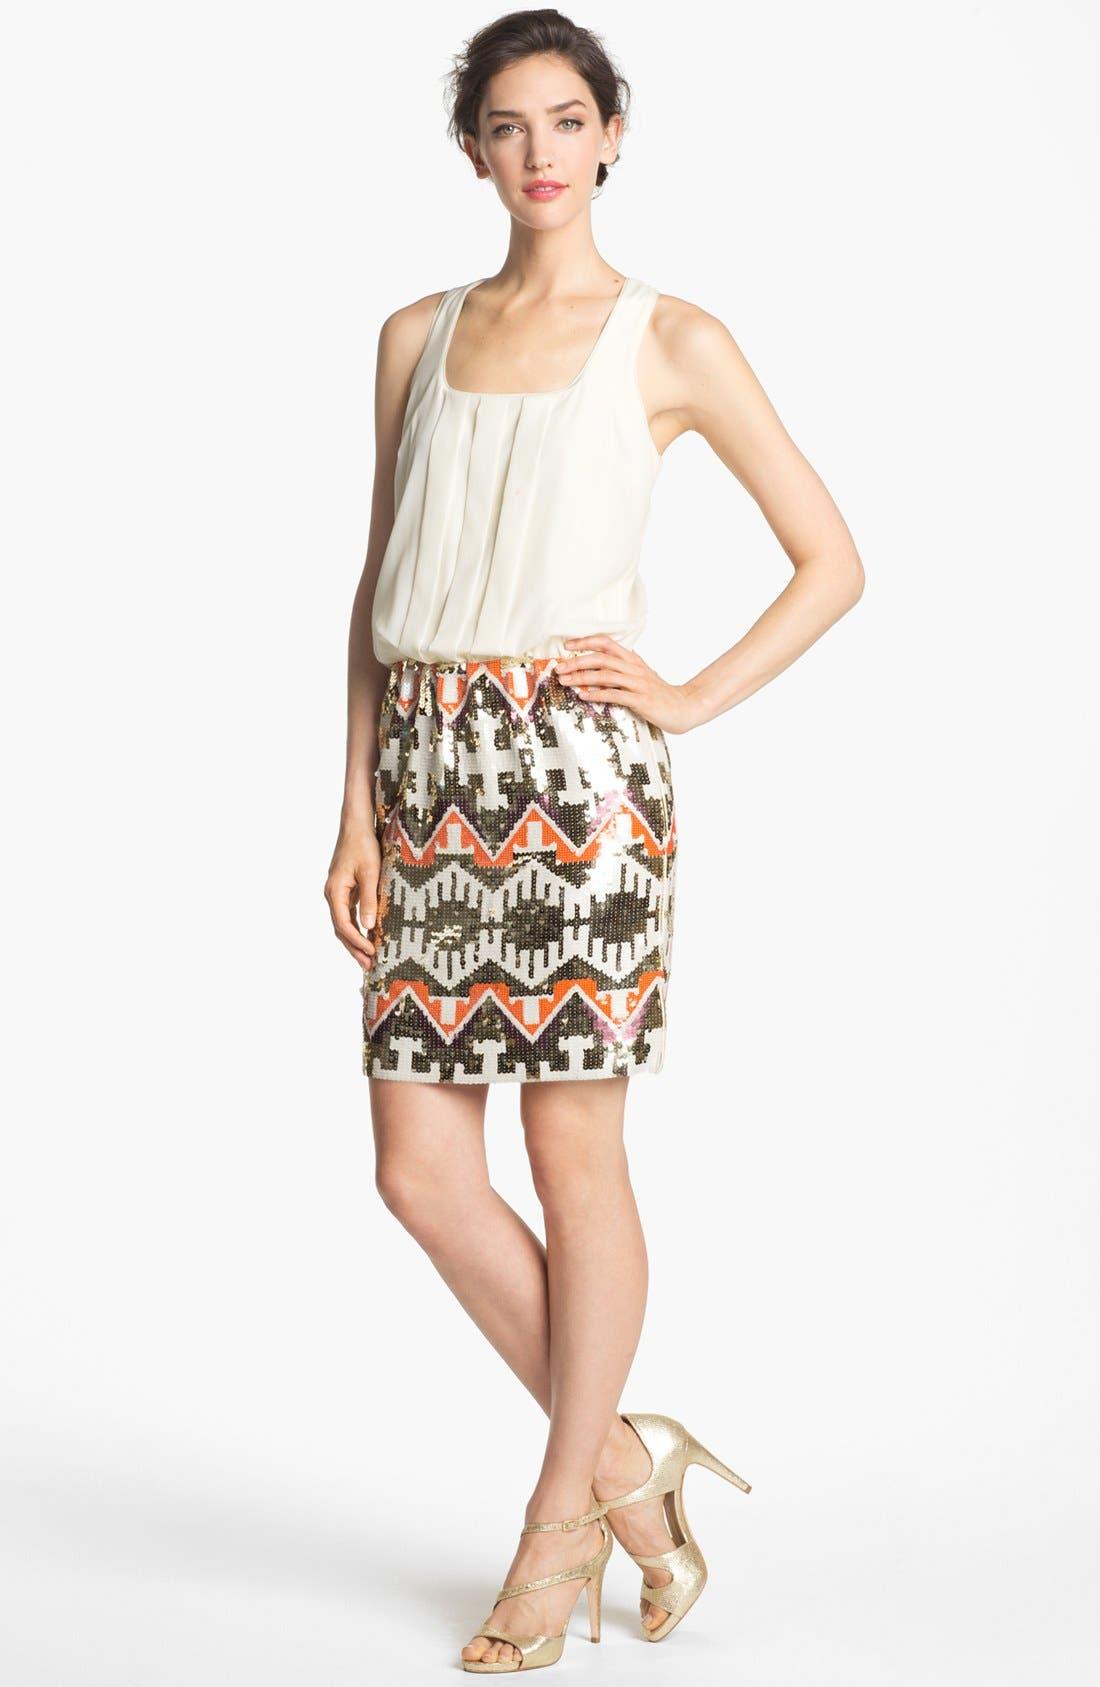 Main Image - Jessica Simpson Racerback Blouson Sequin Skirt Dress